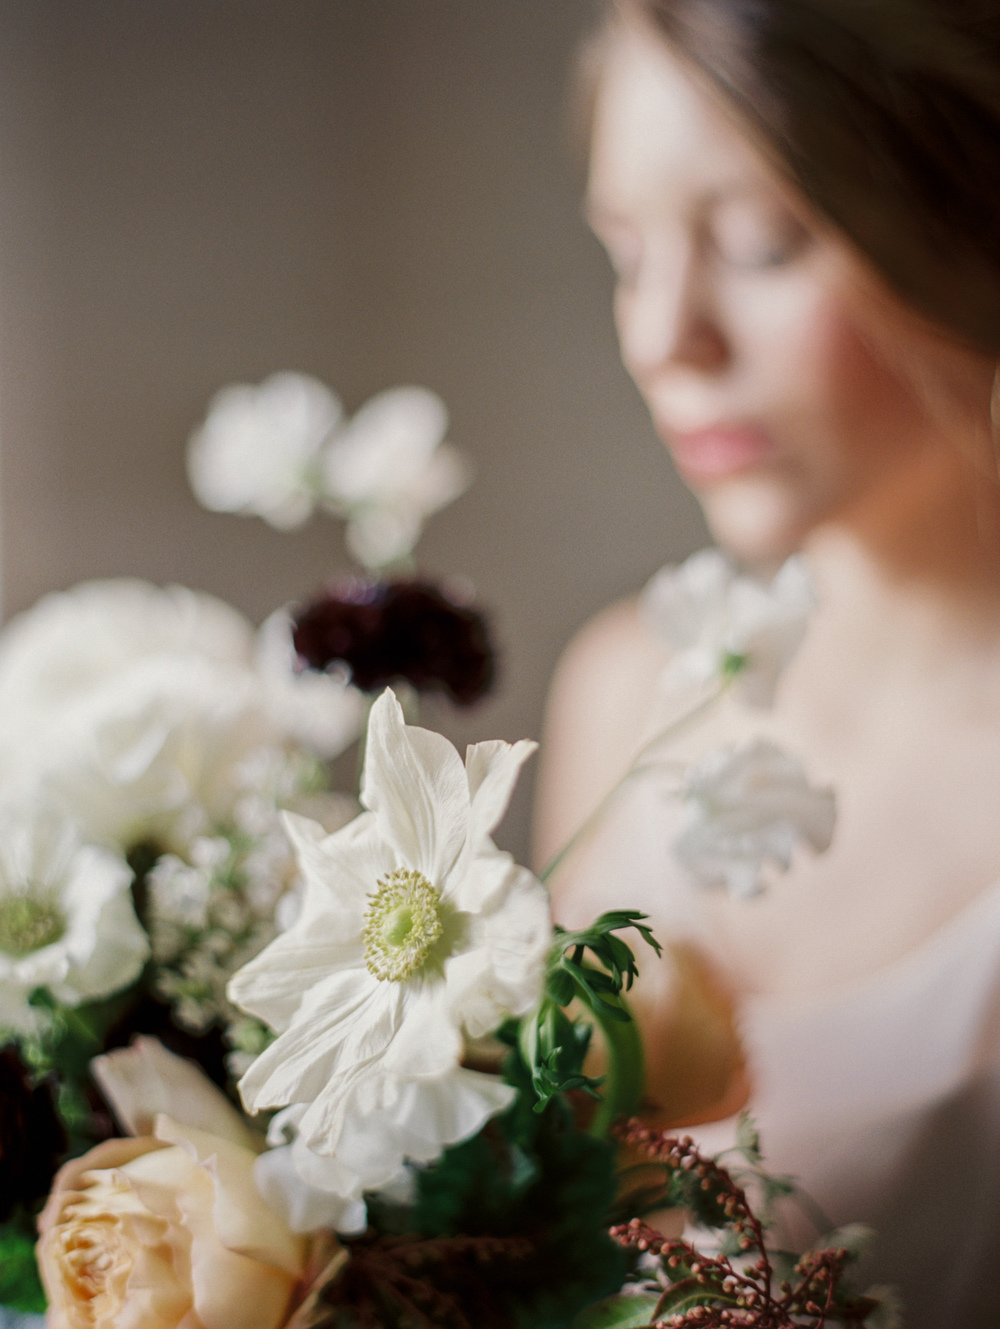 024-Bouquet-Study.jpg